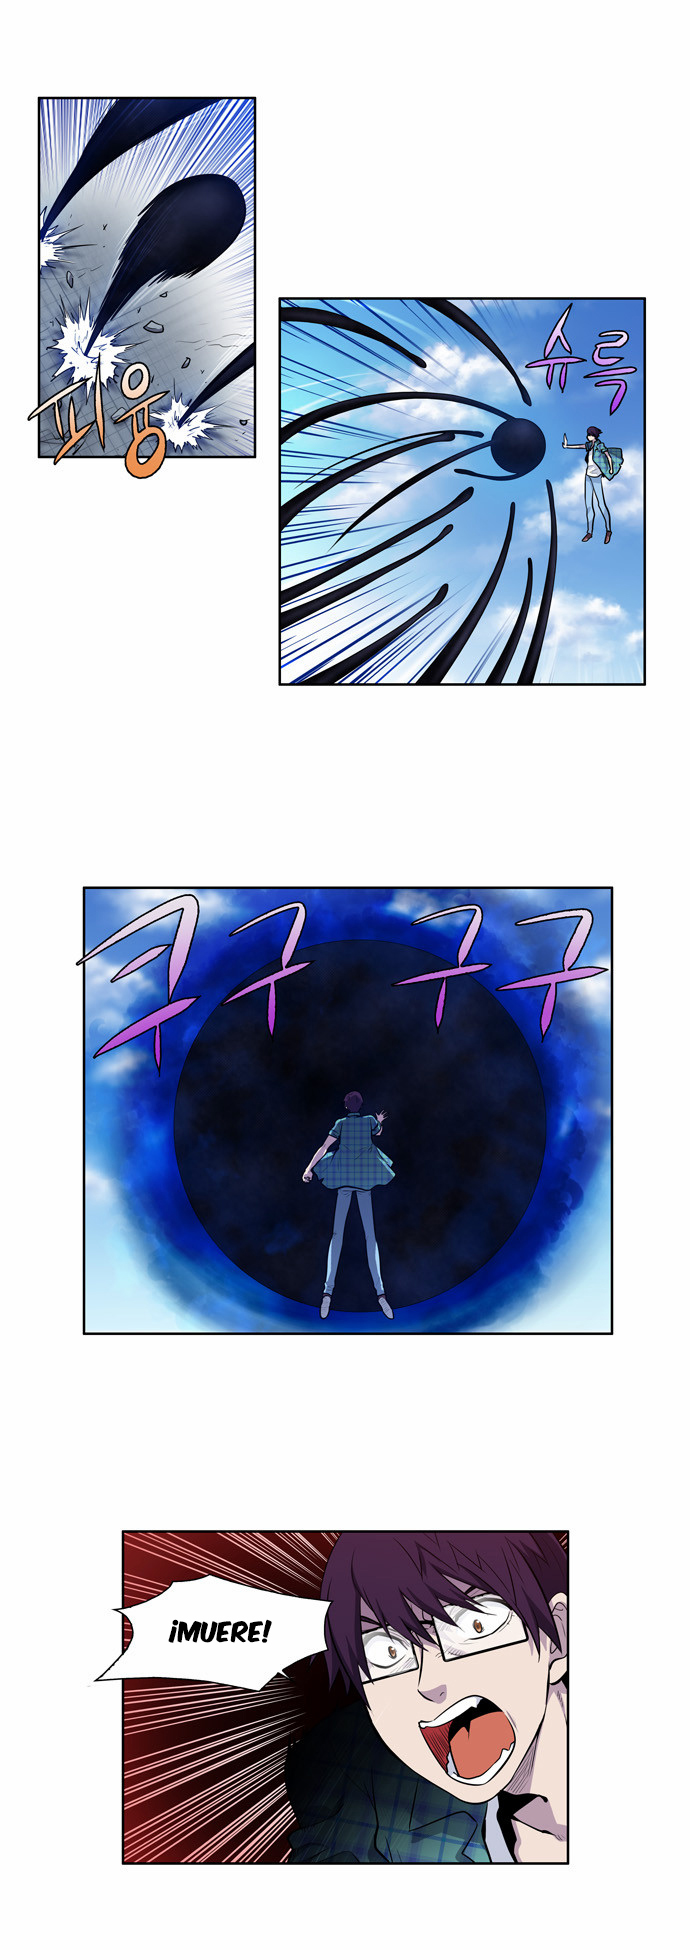 https://c5.ninemanga.com/es_manga/61/1725/439980/0891f5ce1c97f4207820d208852e4133.jpg Page 8